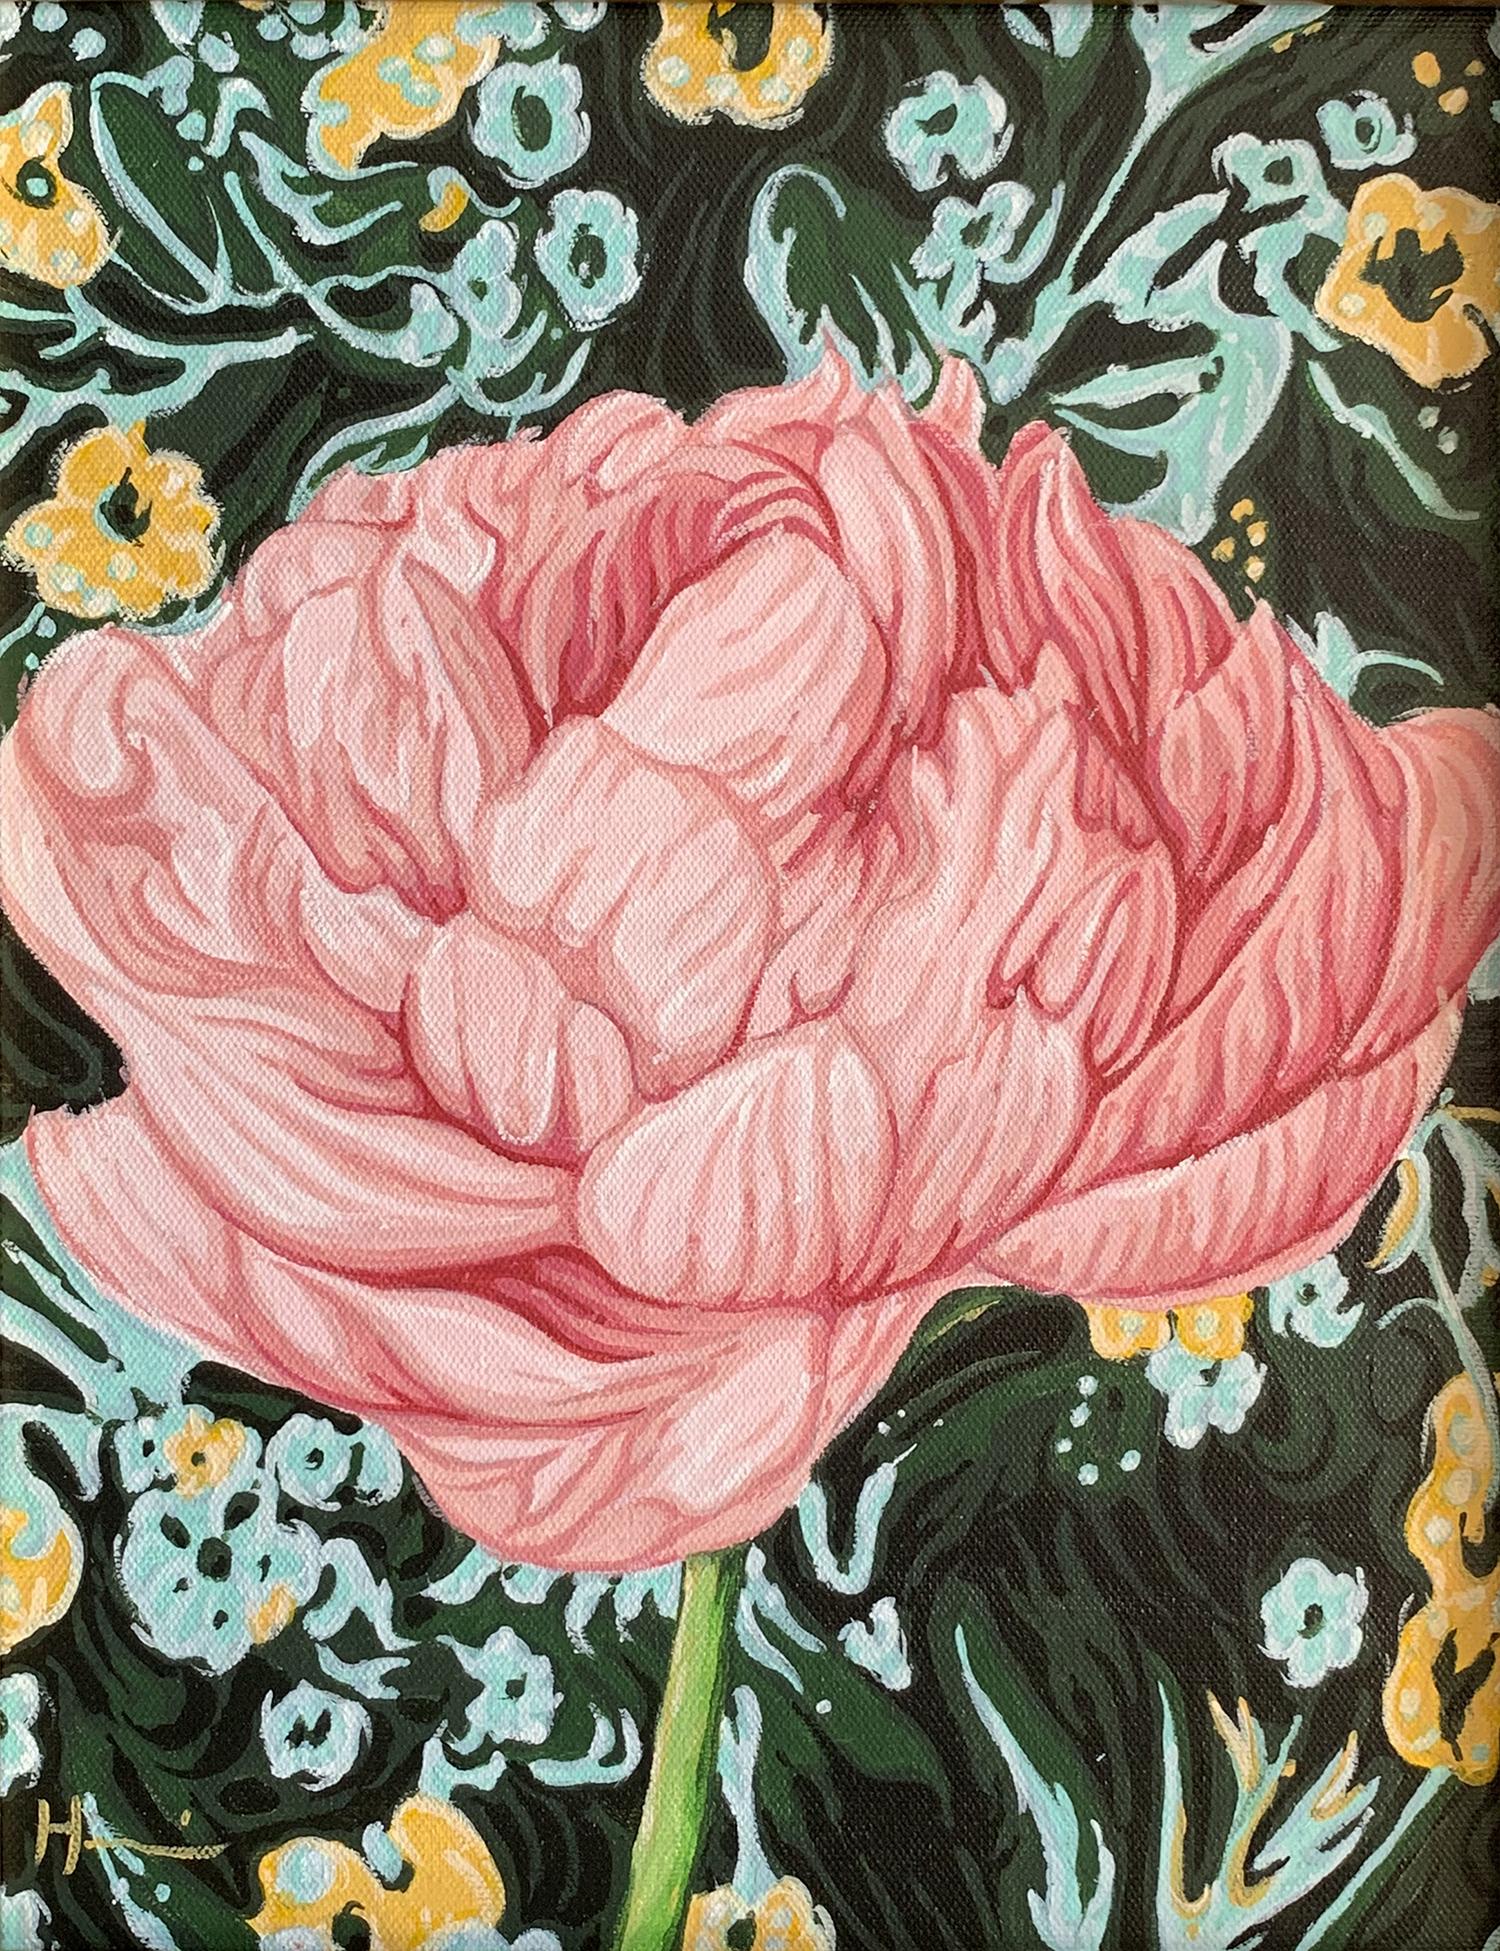 Studio Pintura - Spring Floral Fine Art ExhibitionSaturday, March 16 20191:00 - 5:00Studio Pintura Fine Art Gallery | #293 Northrup King Bldg 1500 Jackson Street NE, MPLS 55413